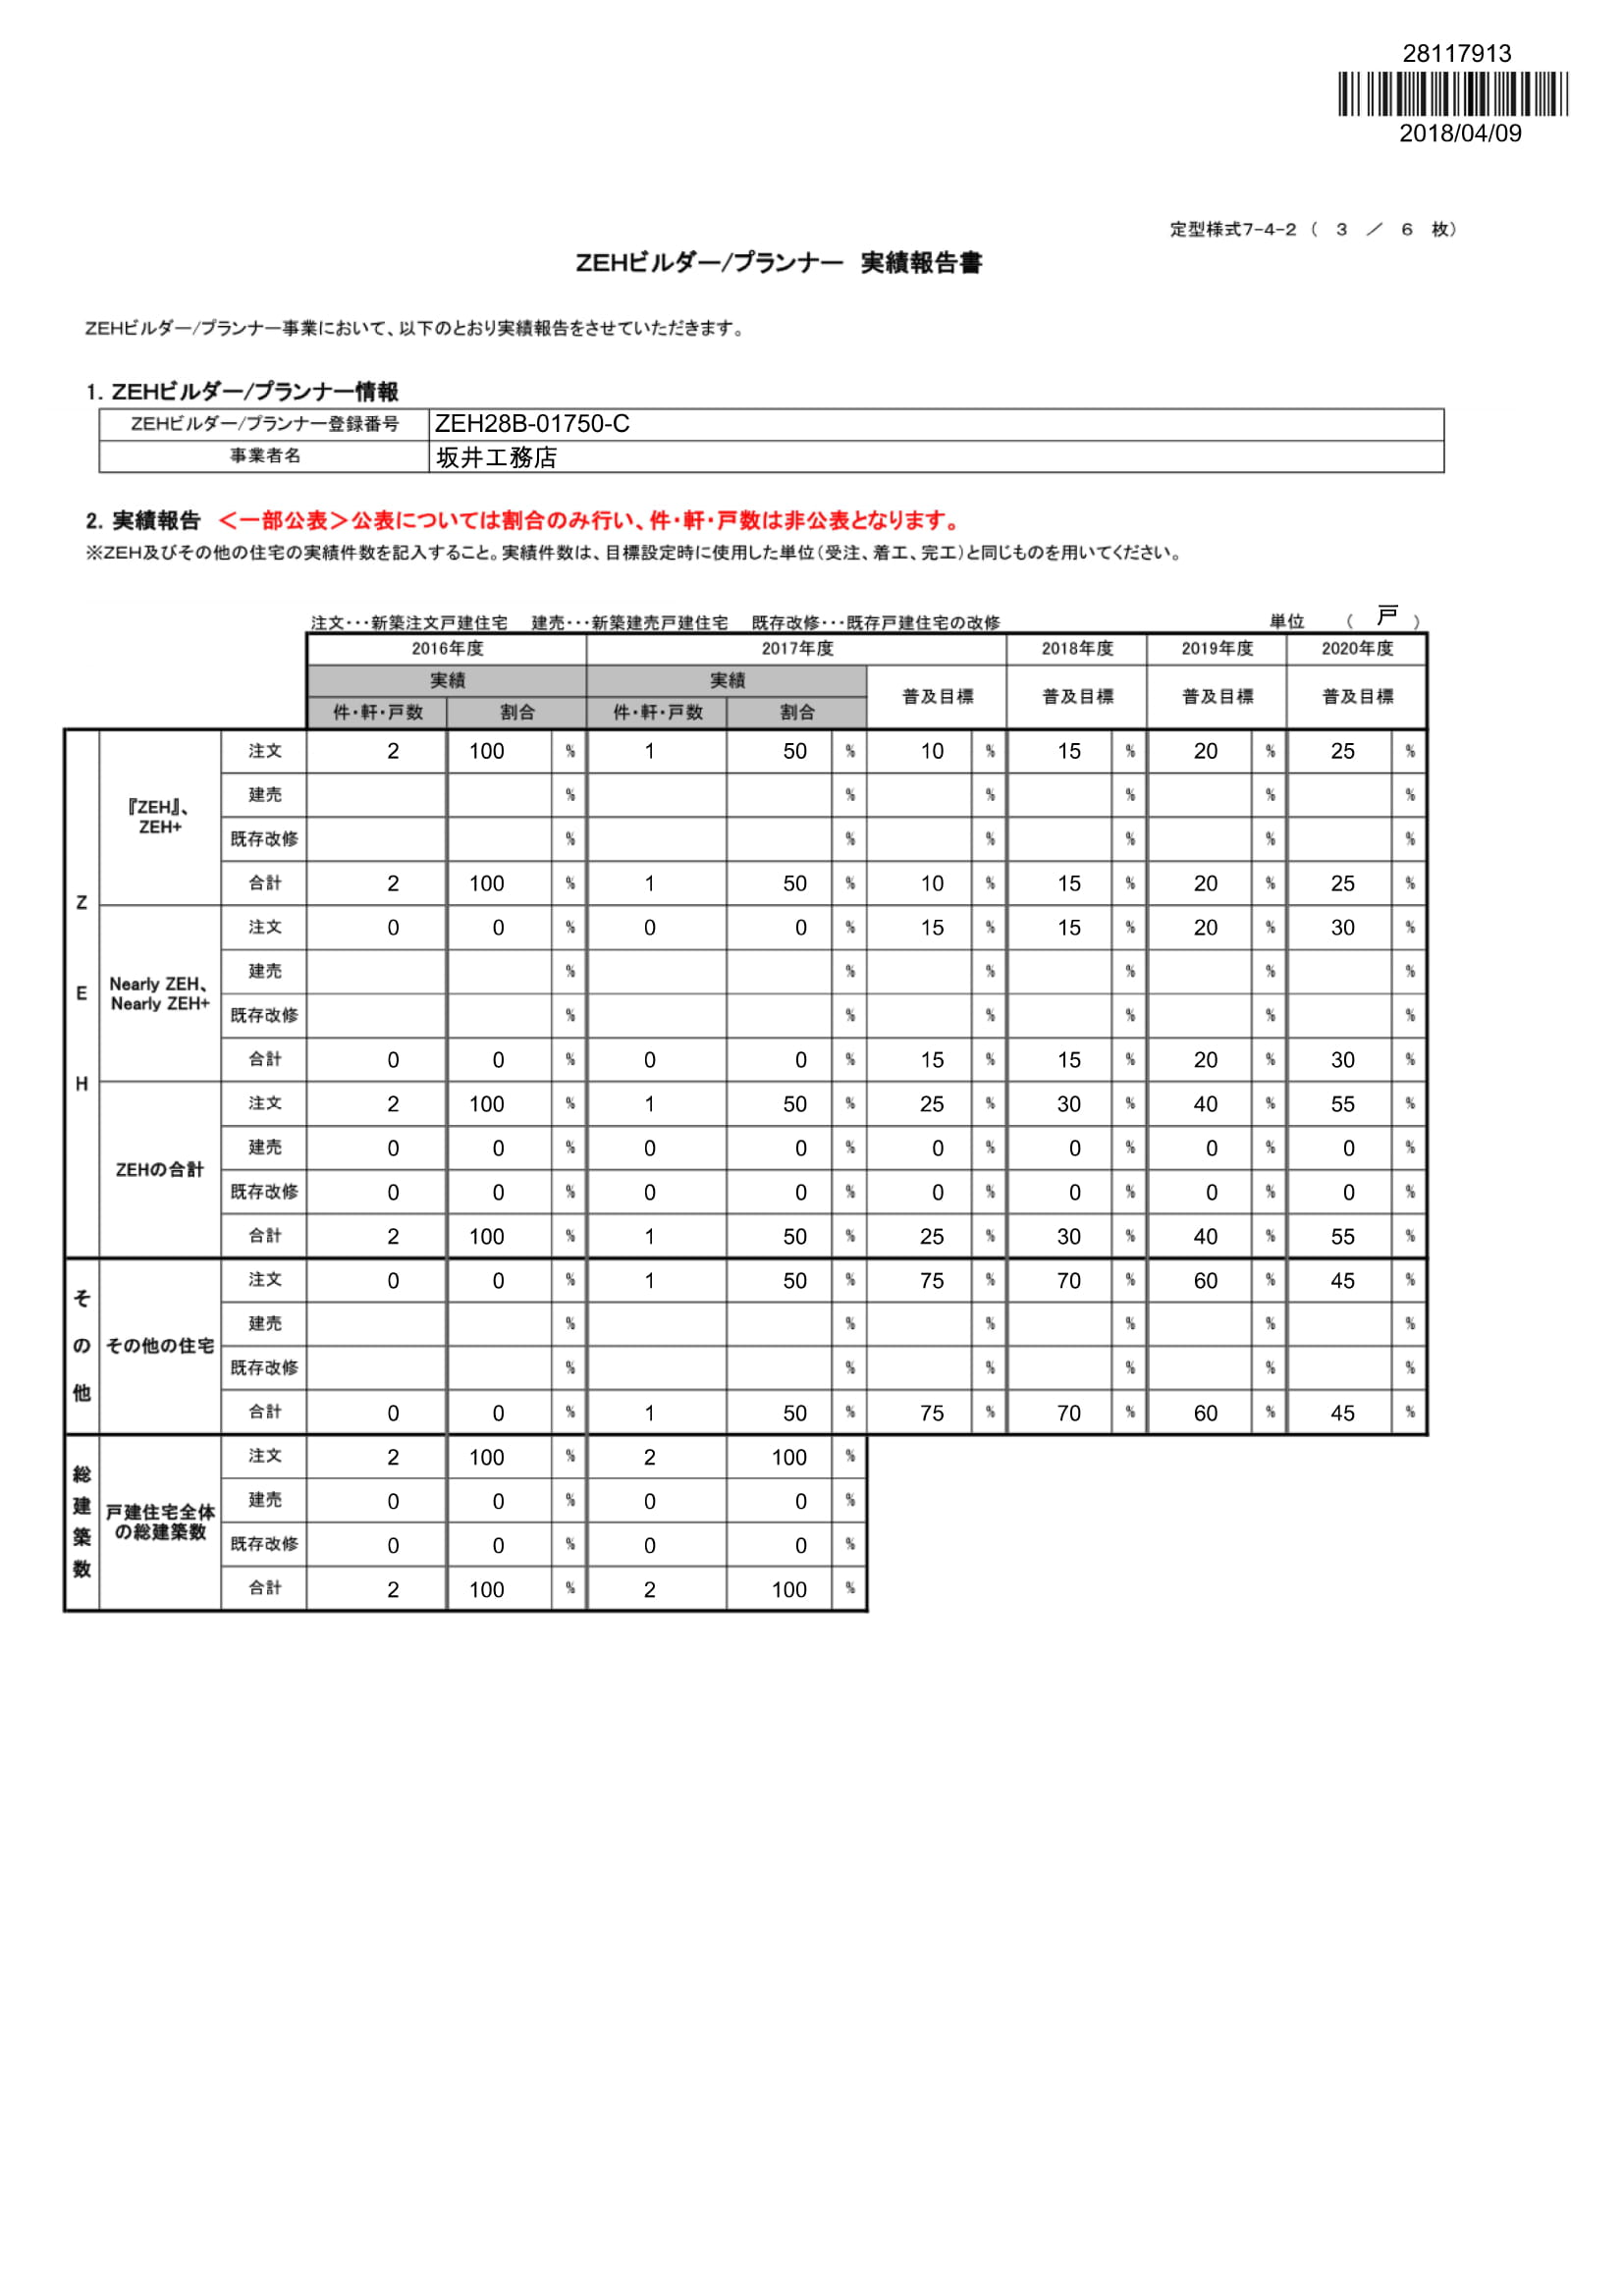 ZHHビルダー/プランナー 実績報告書